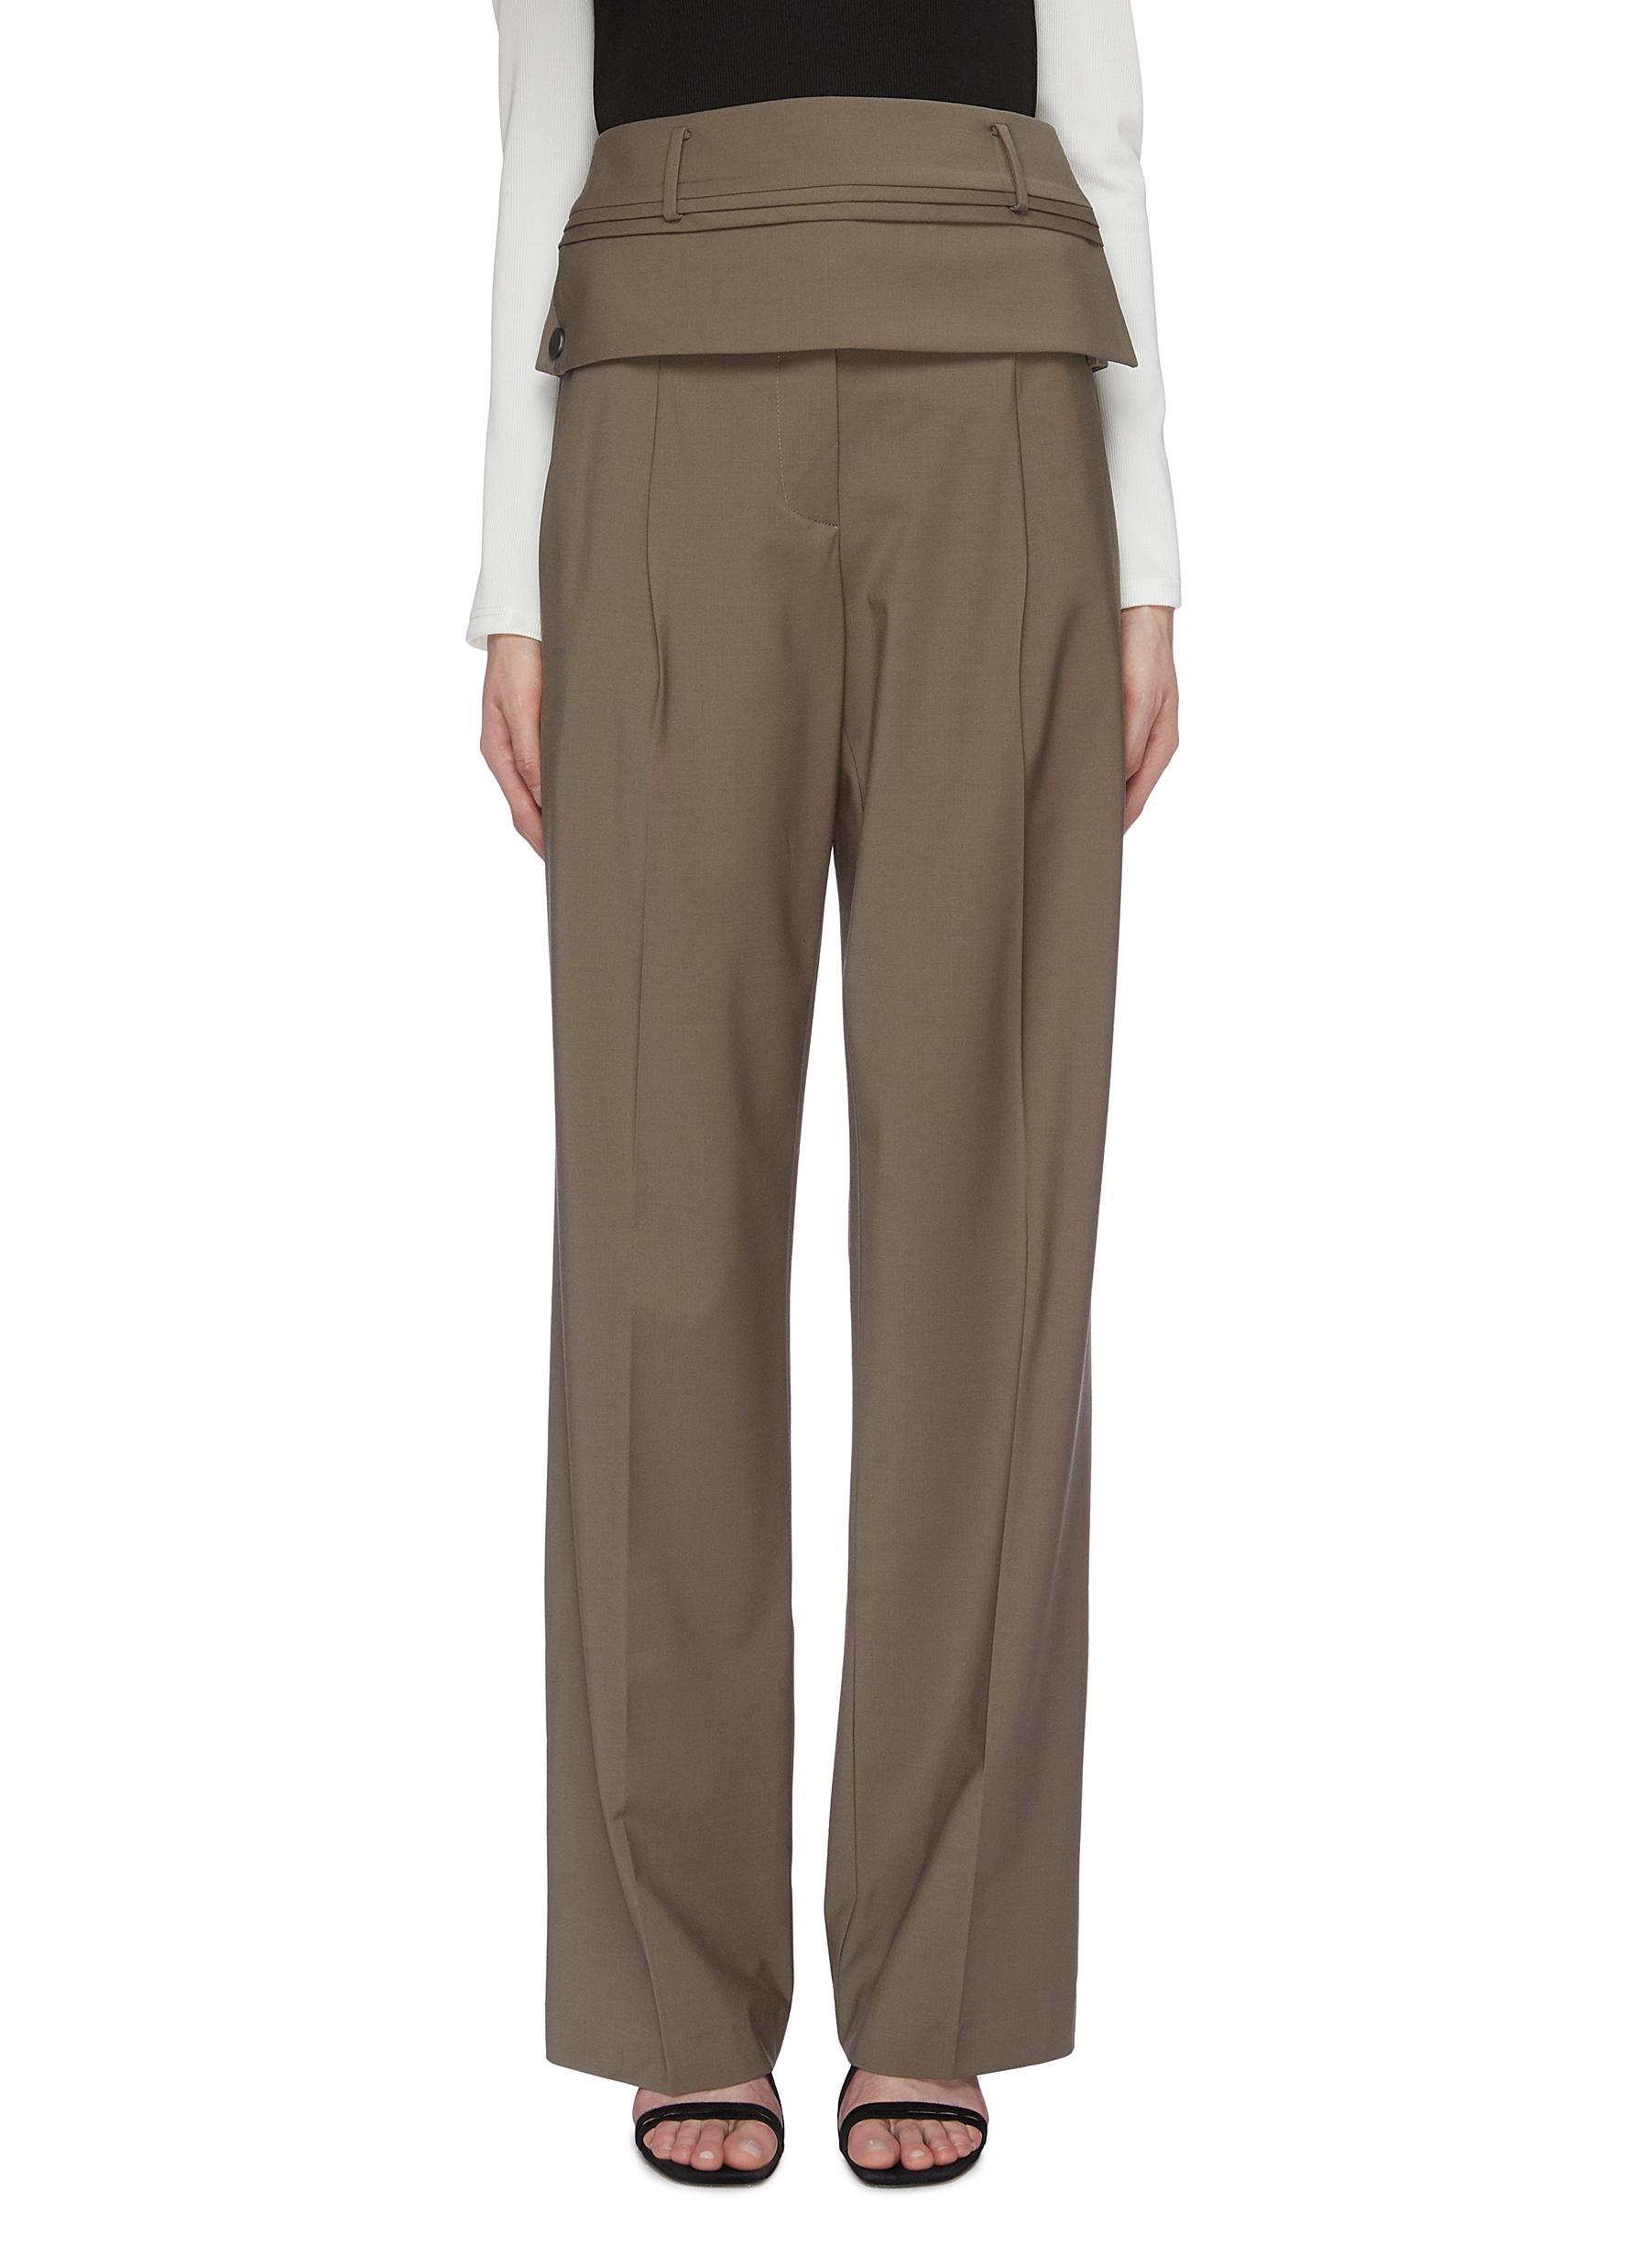 Detachable belt loop waist panel suiting pants by Christopher Esber